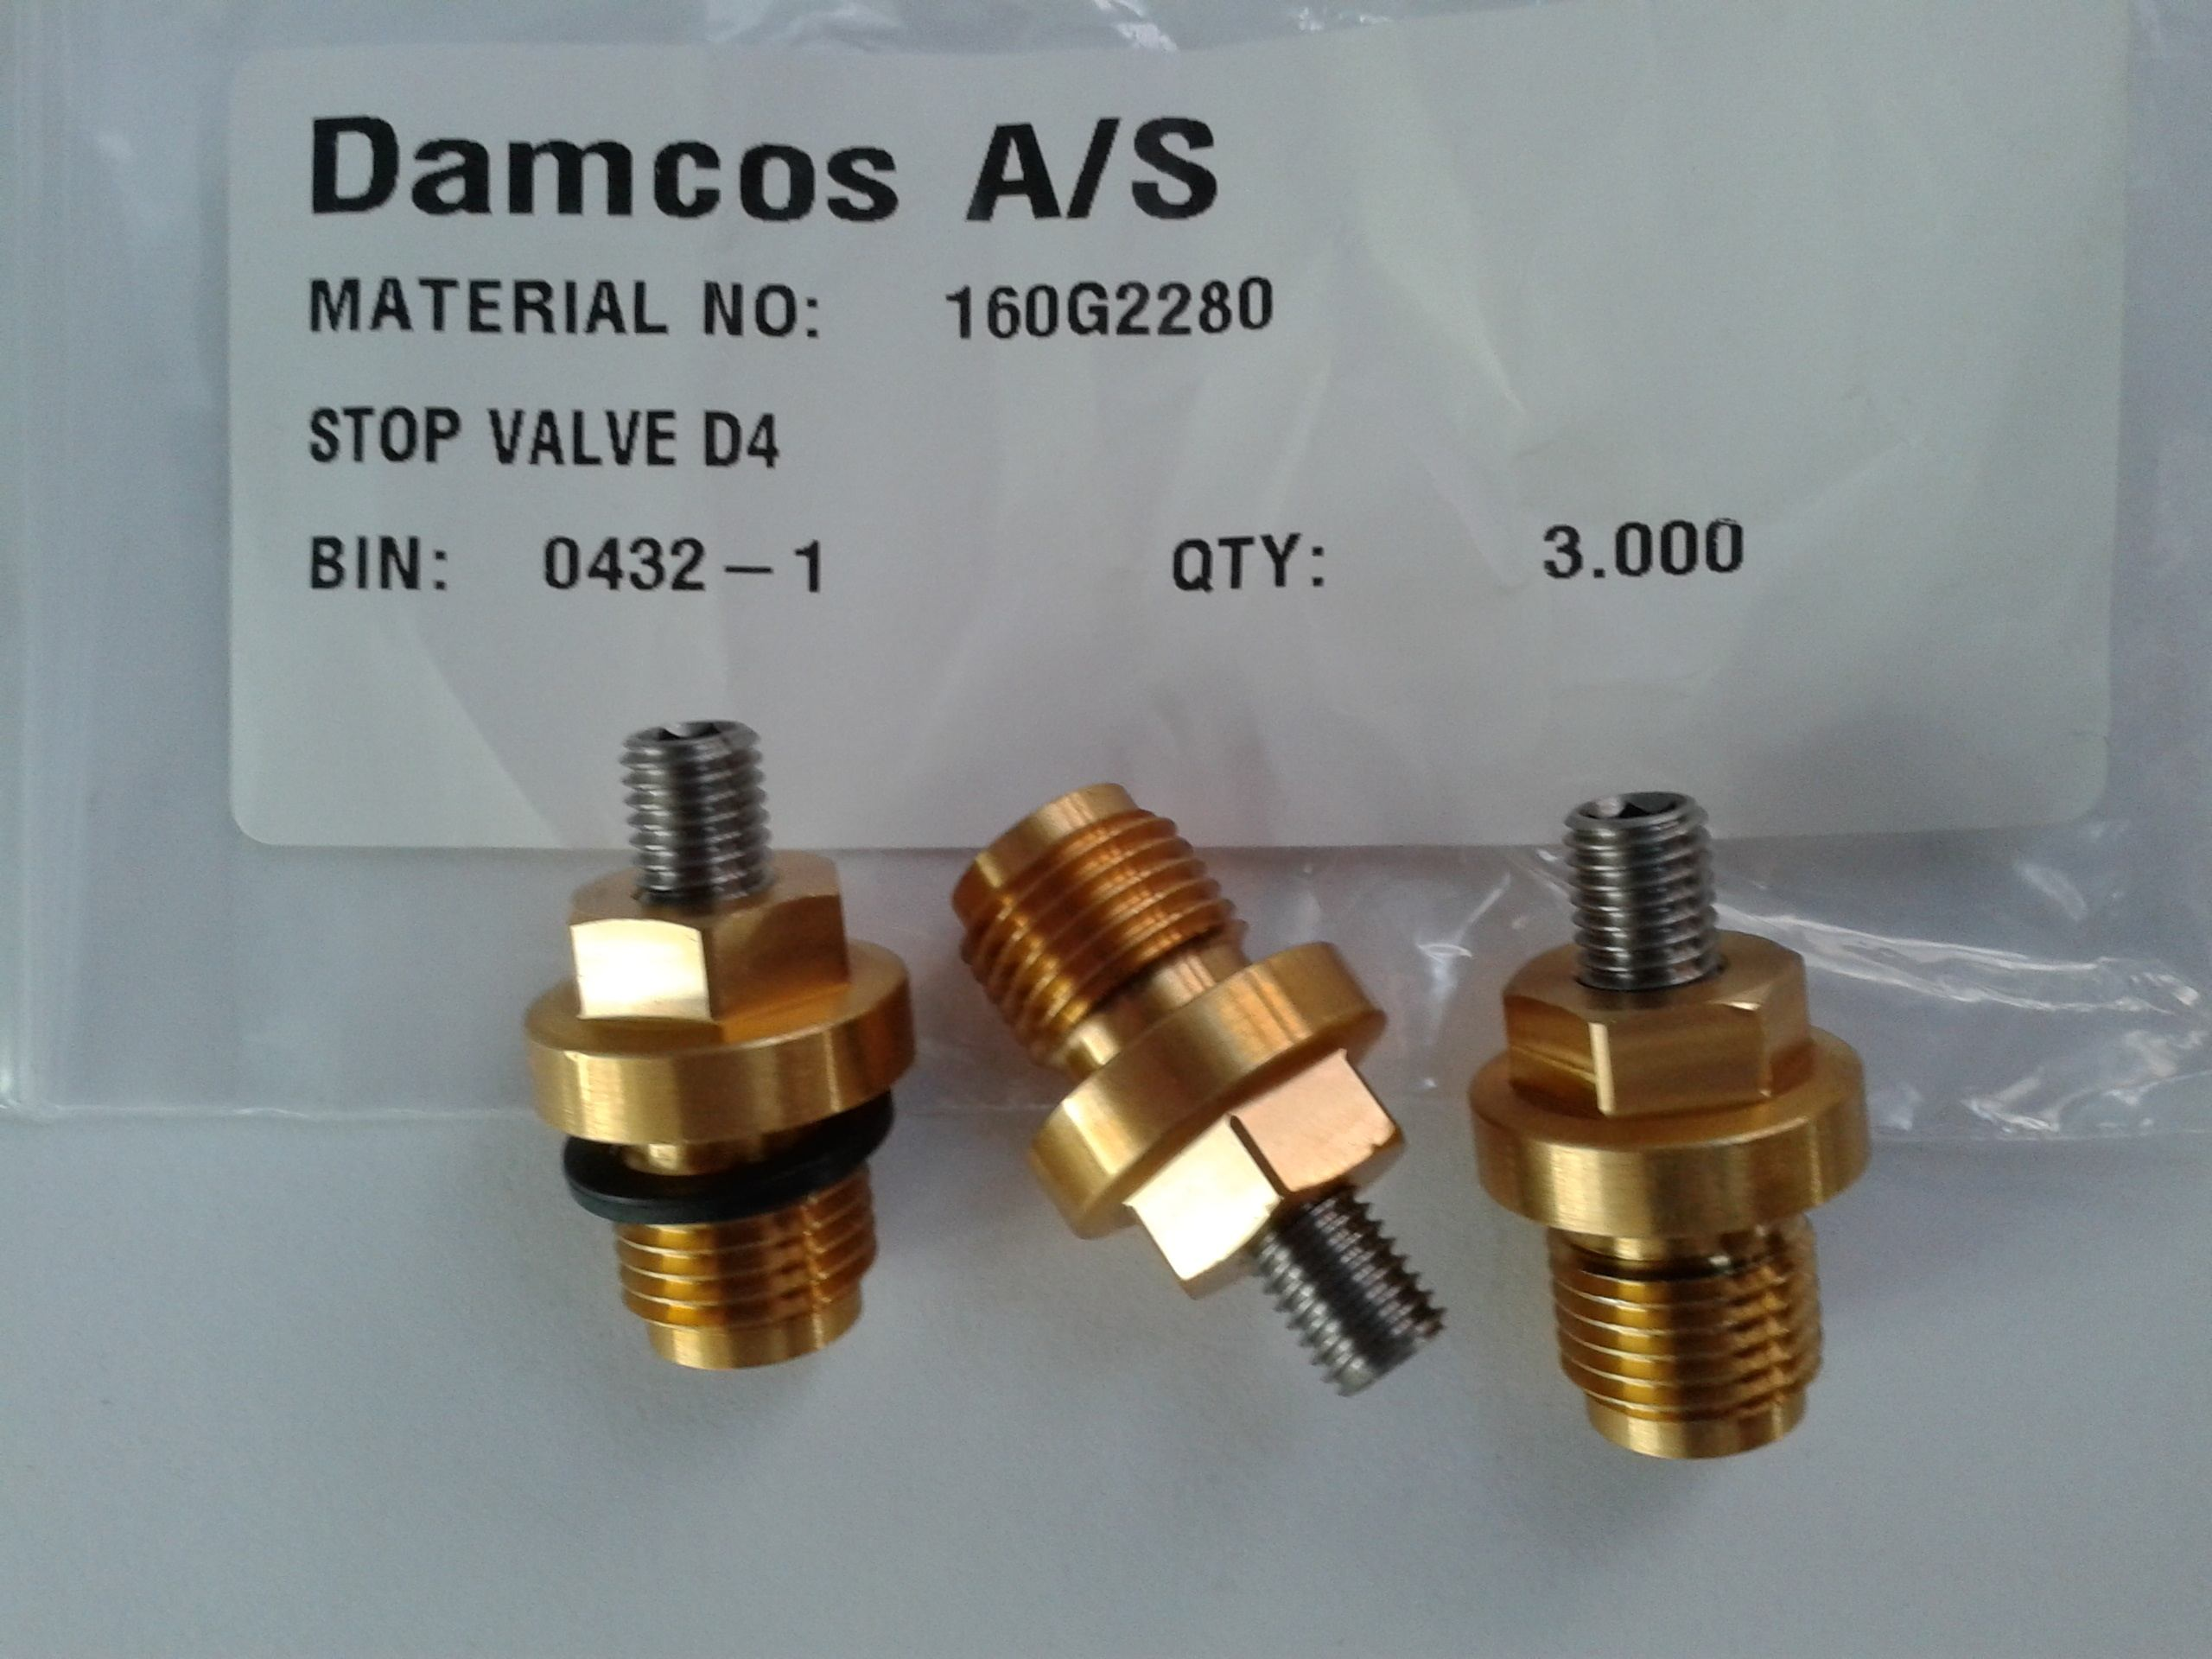 Damcos-160G2280-Stop-Valve-D4